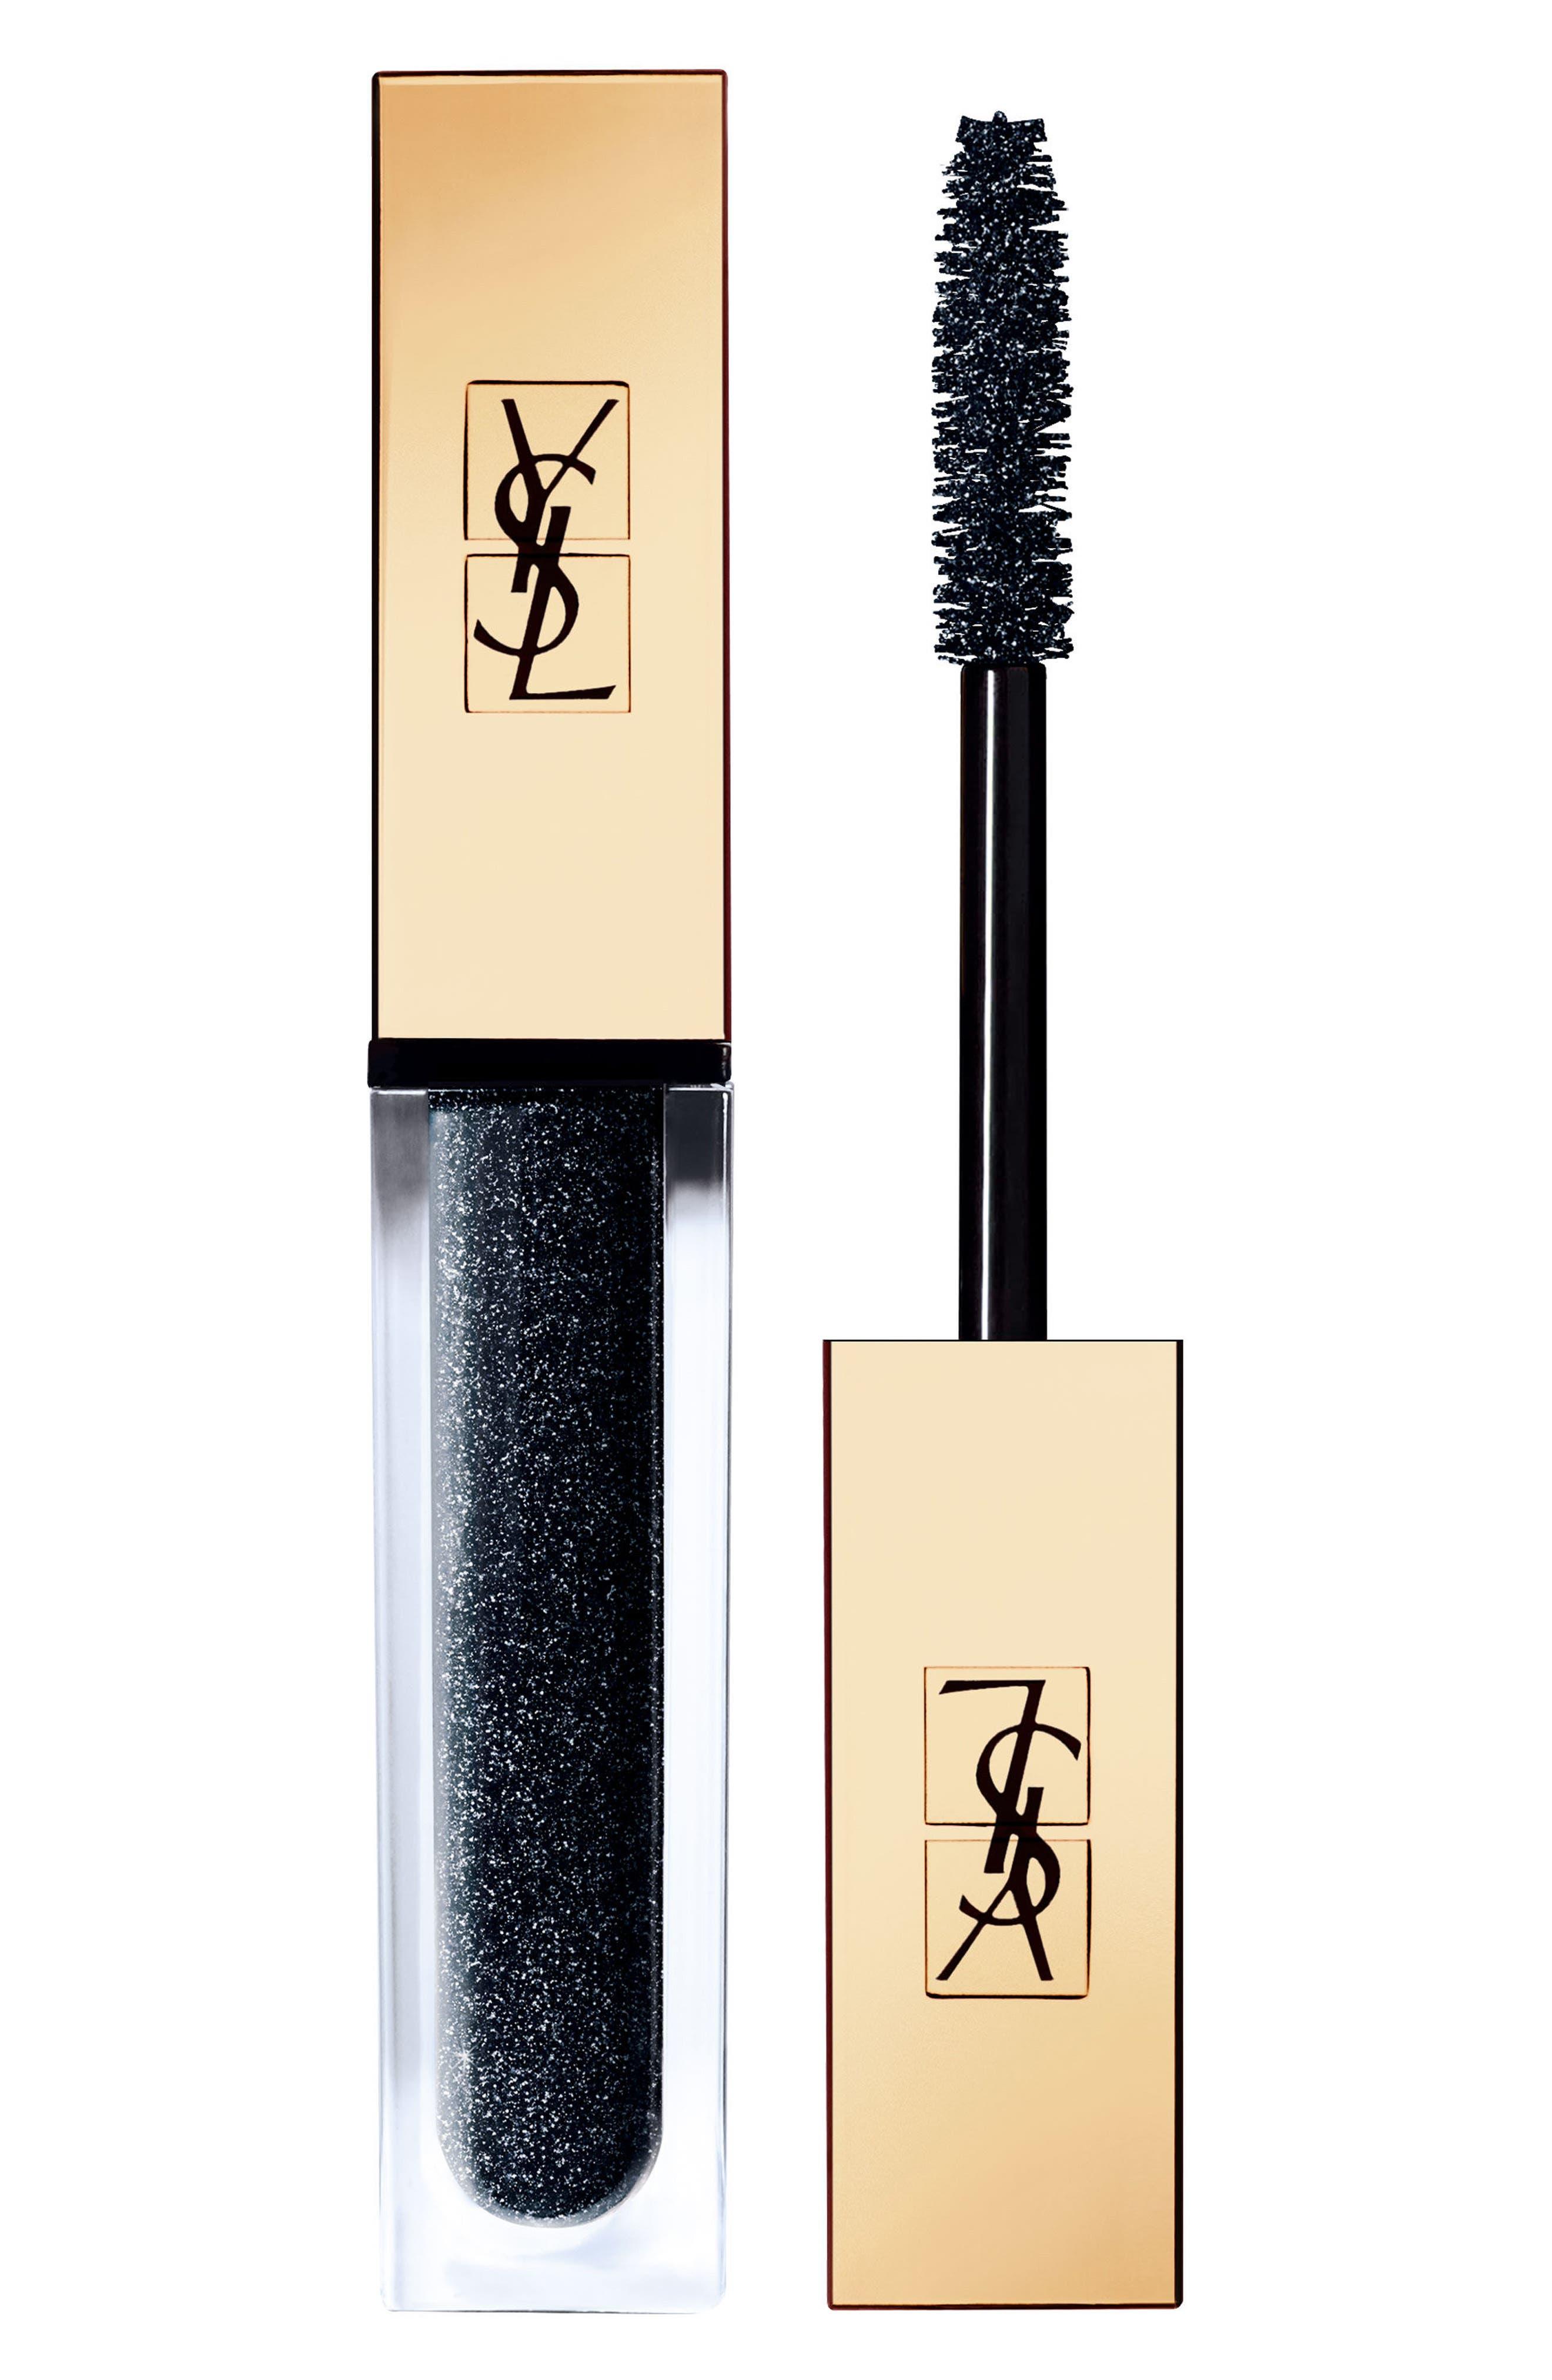 Yves Saint Laurent Mascara Vinyl Couture (Nordstrom Exclusive)